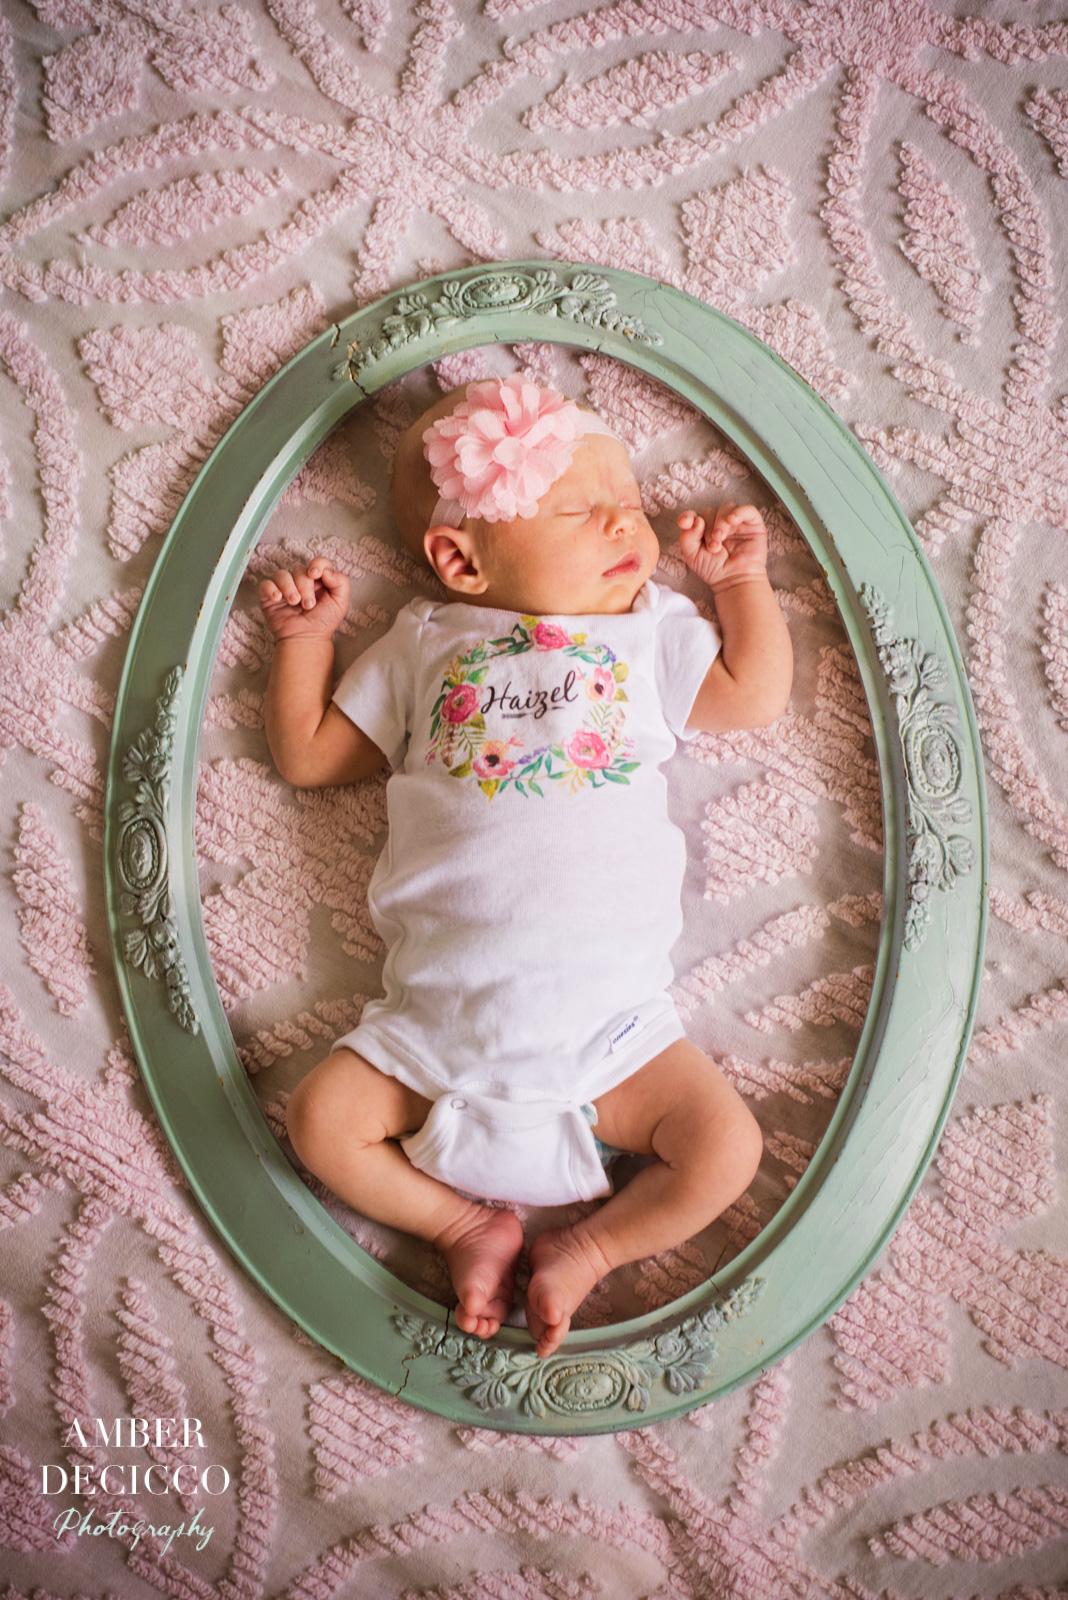 haizel-newborn-adeciccophoto-5032.jpg